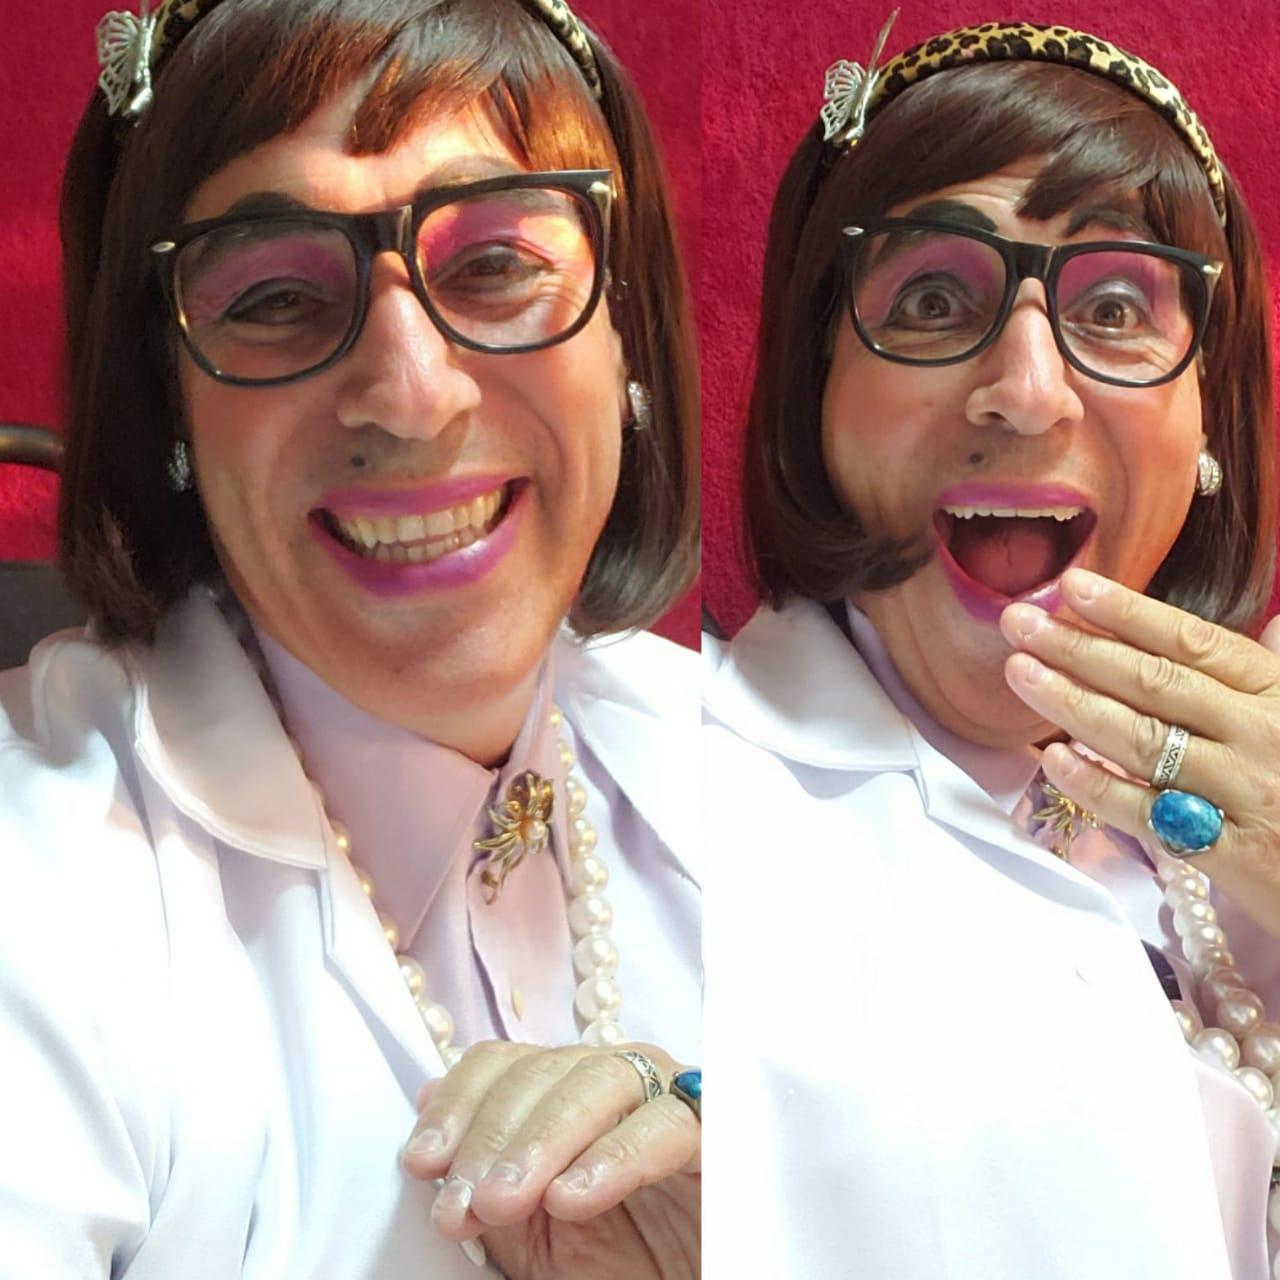 A Dra.Vava